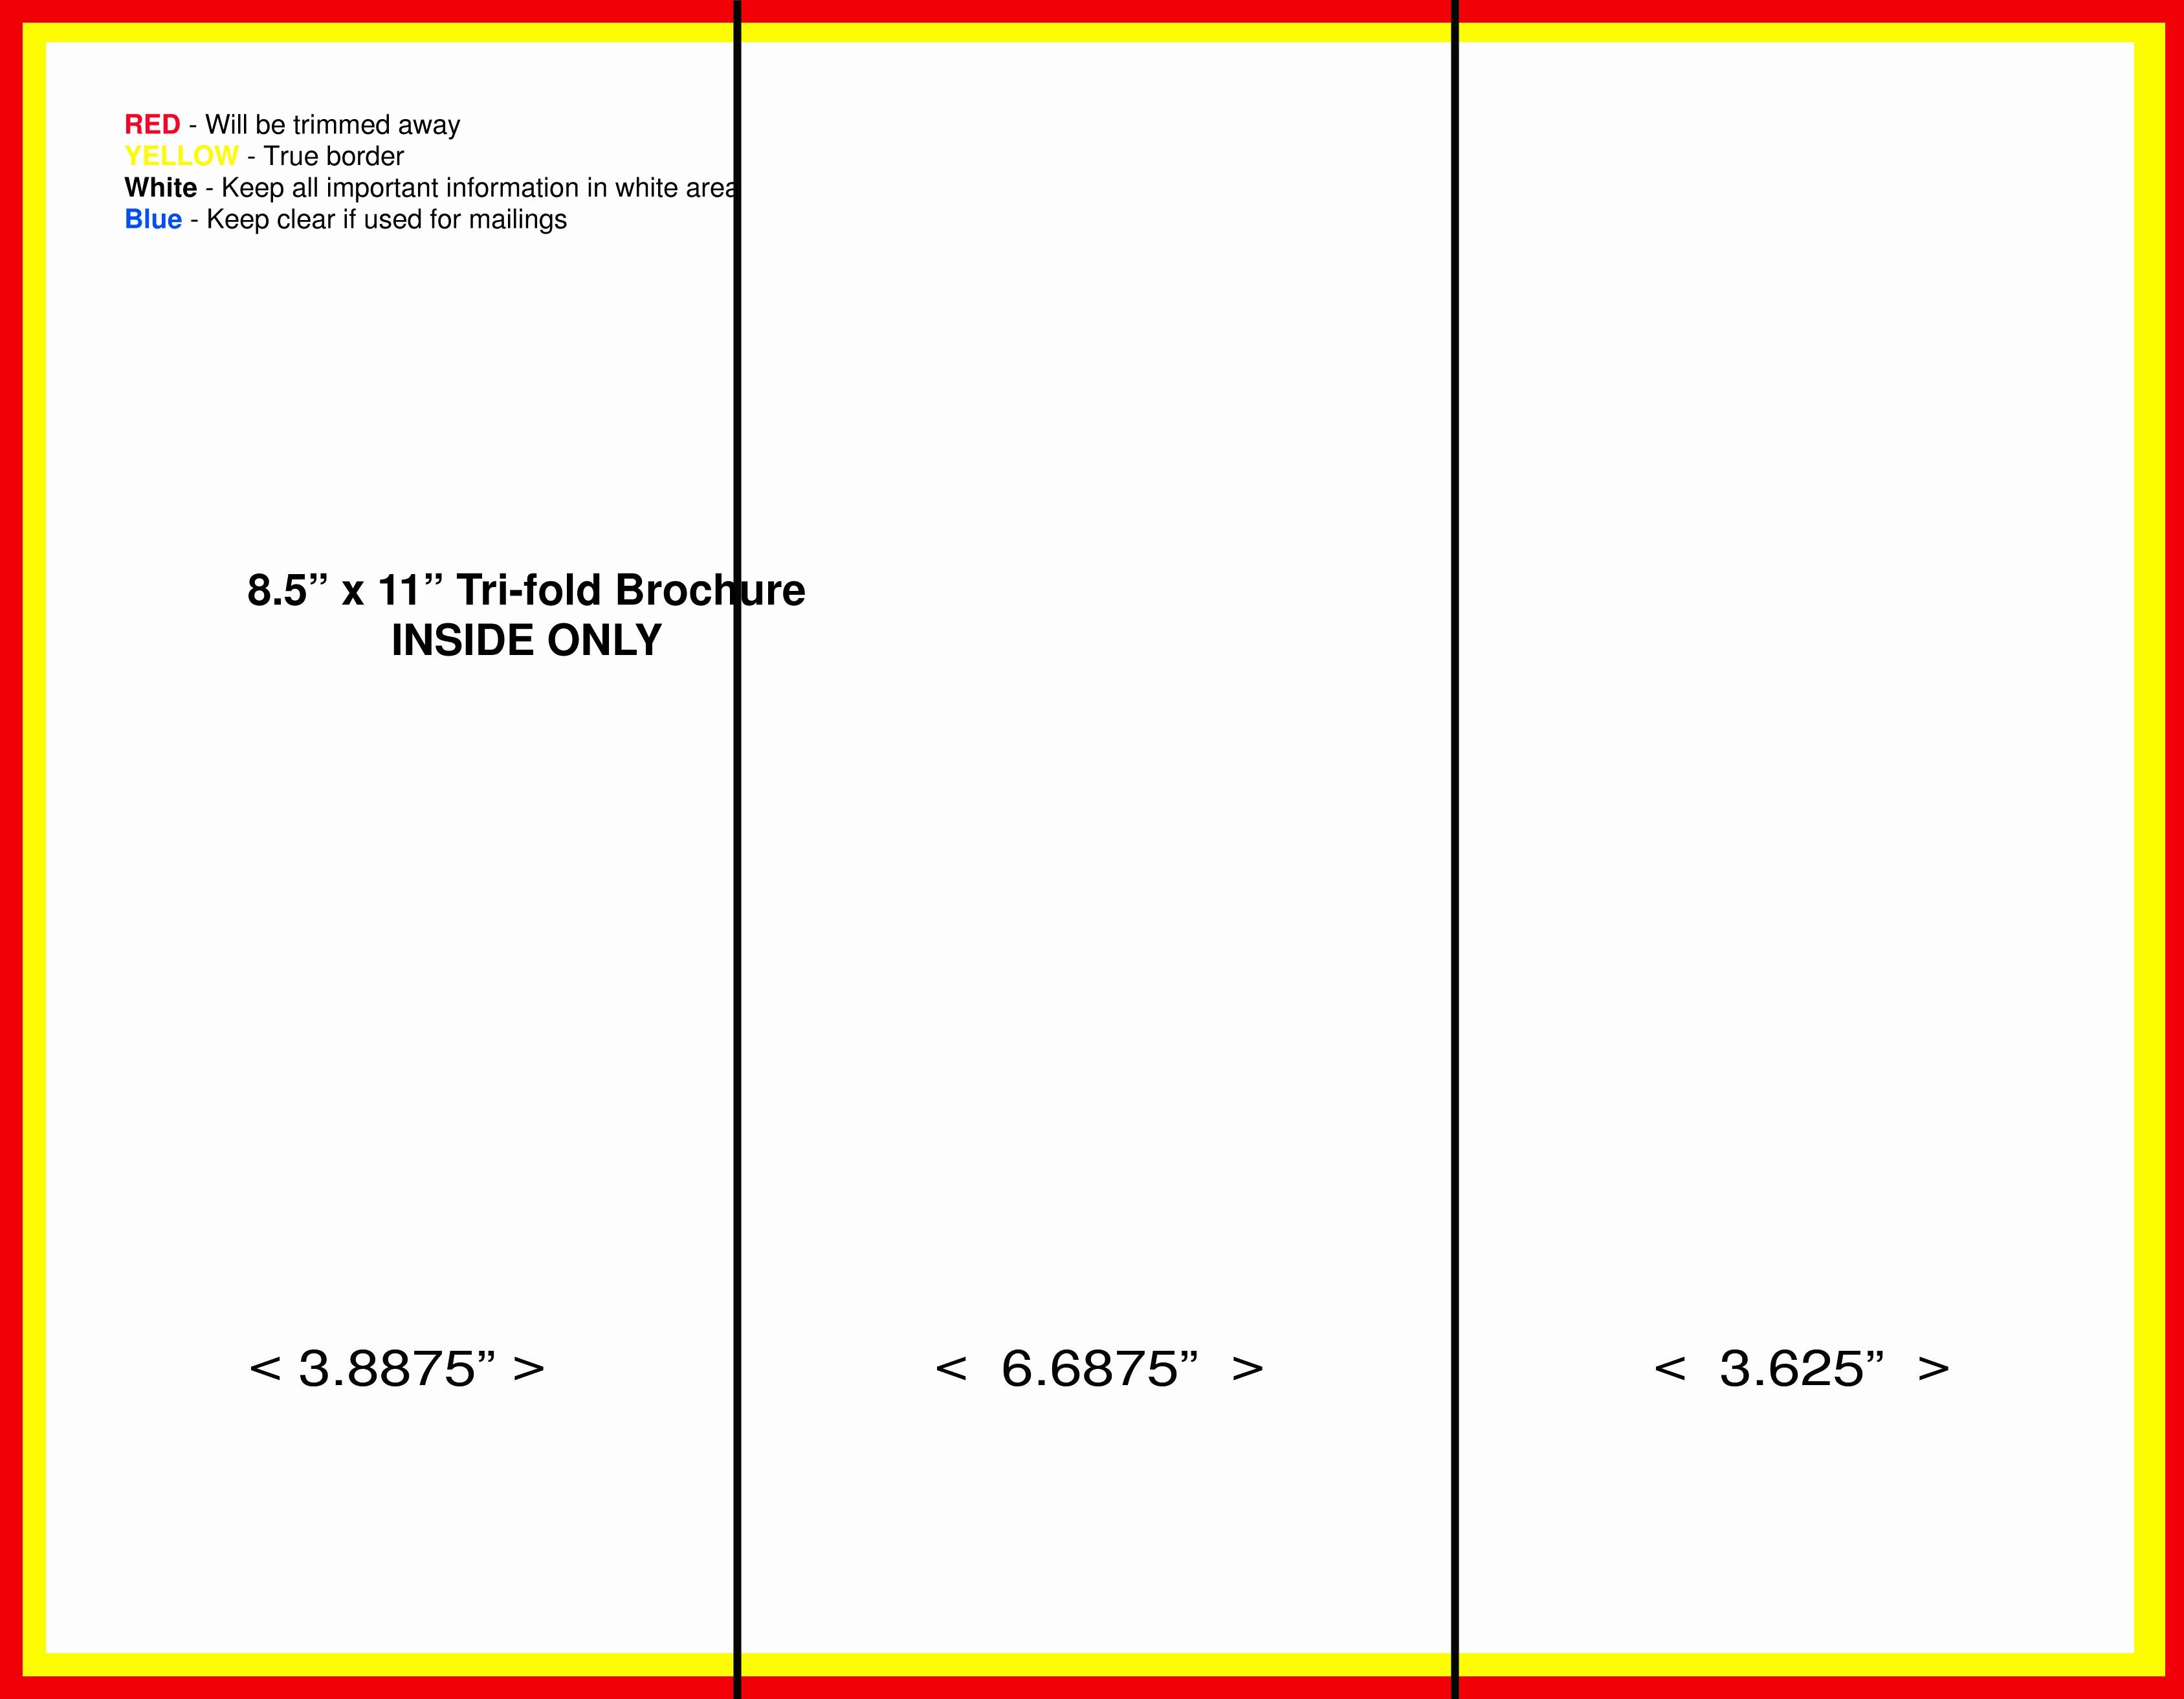 Microsoft Tri Fold Brochure Templates Awesome Tri Fold Brochure Template Microsoft Word